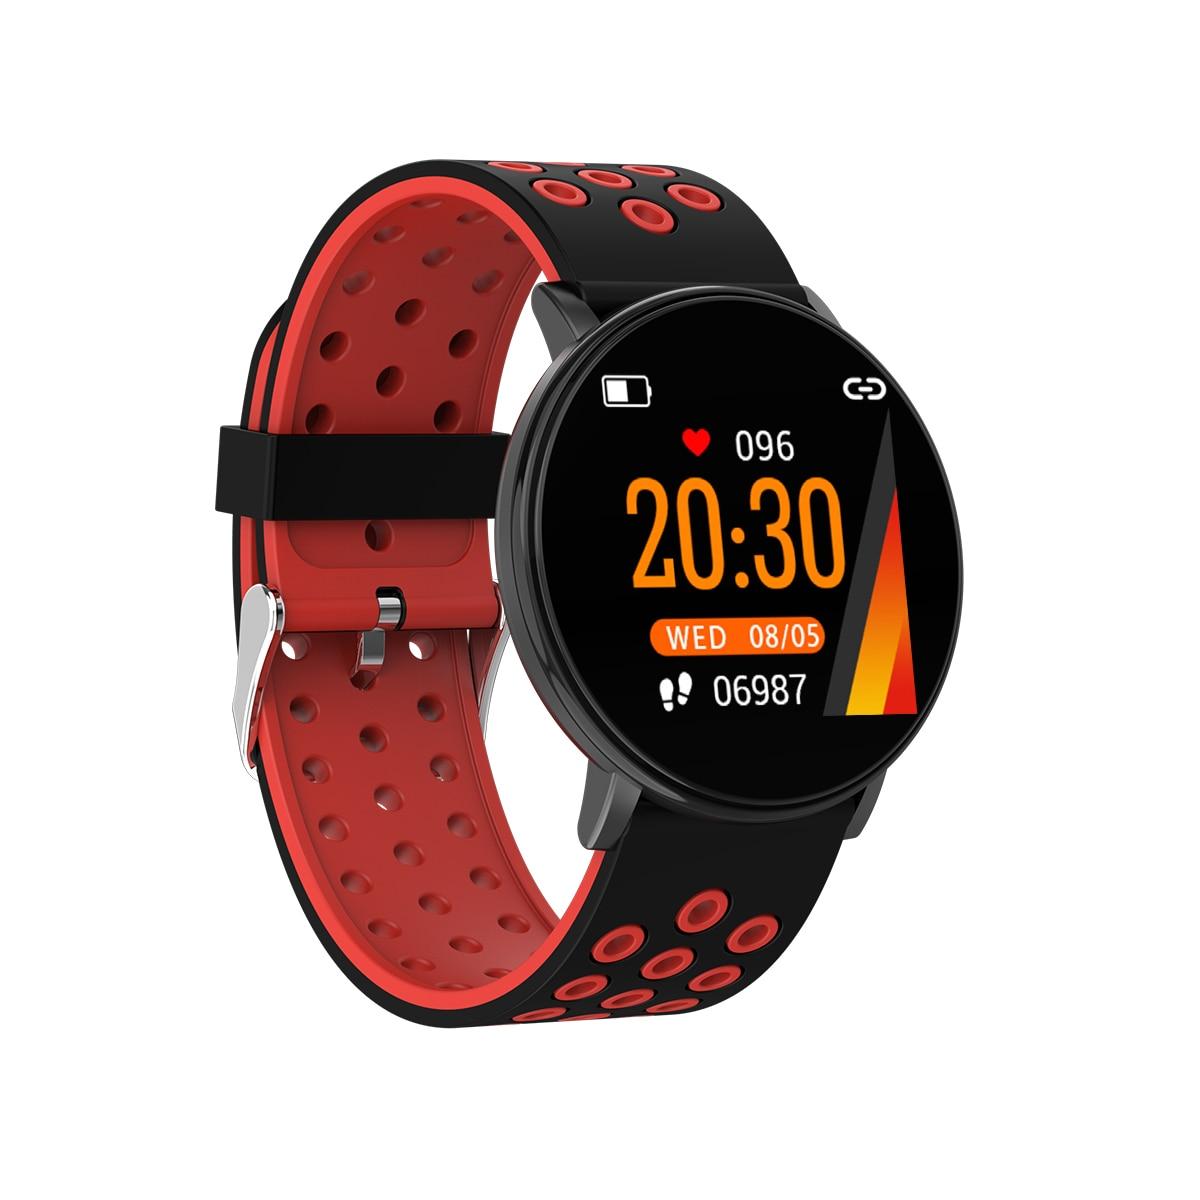 New Smartwatch  Waterproof Sports for iphone Smart watch phone Heart Rate Monitor Blood Pressure Functions For Women men Pakistan